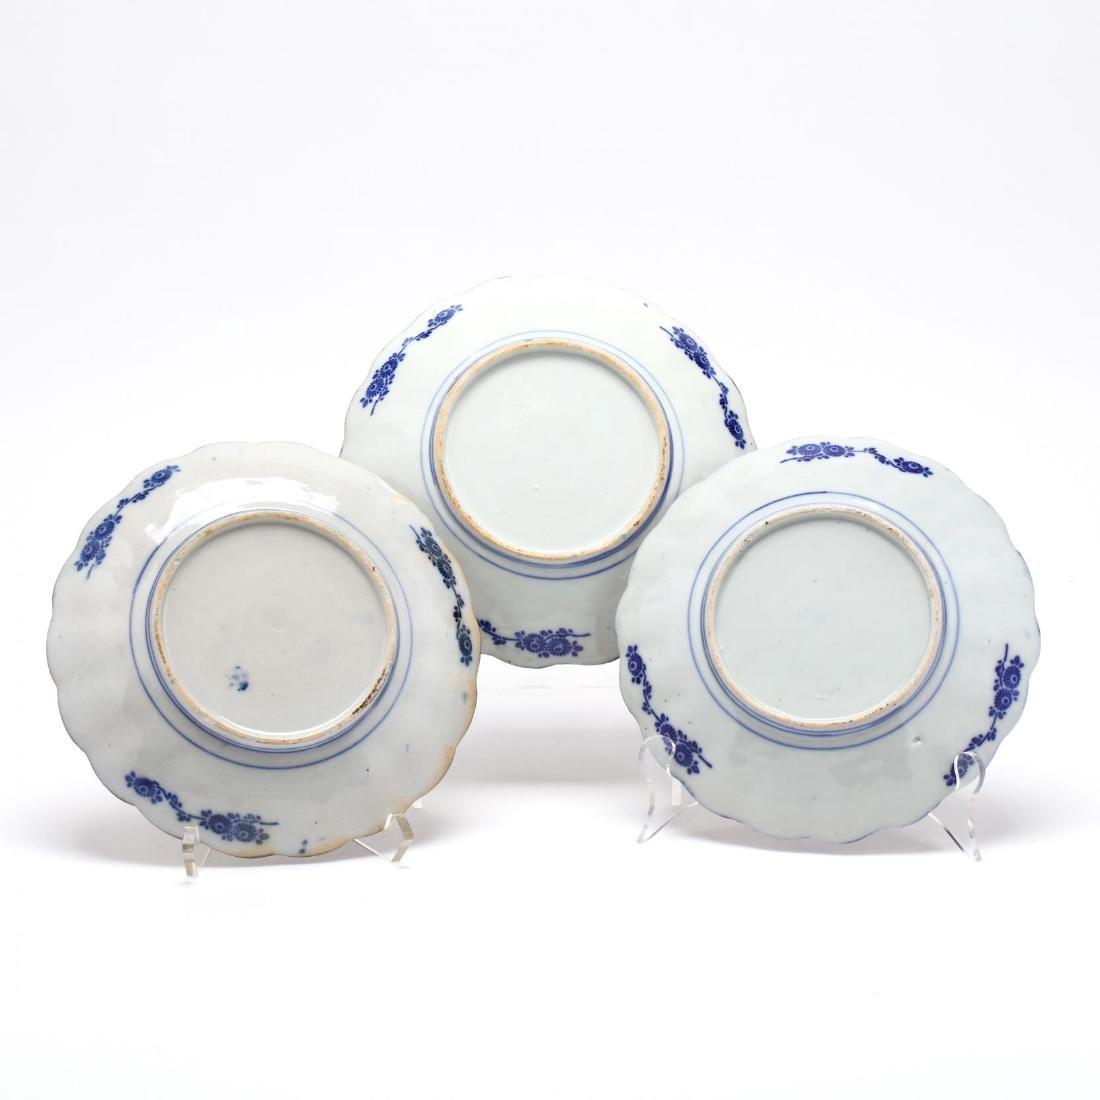 A Group of Imari Porcelain - 3